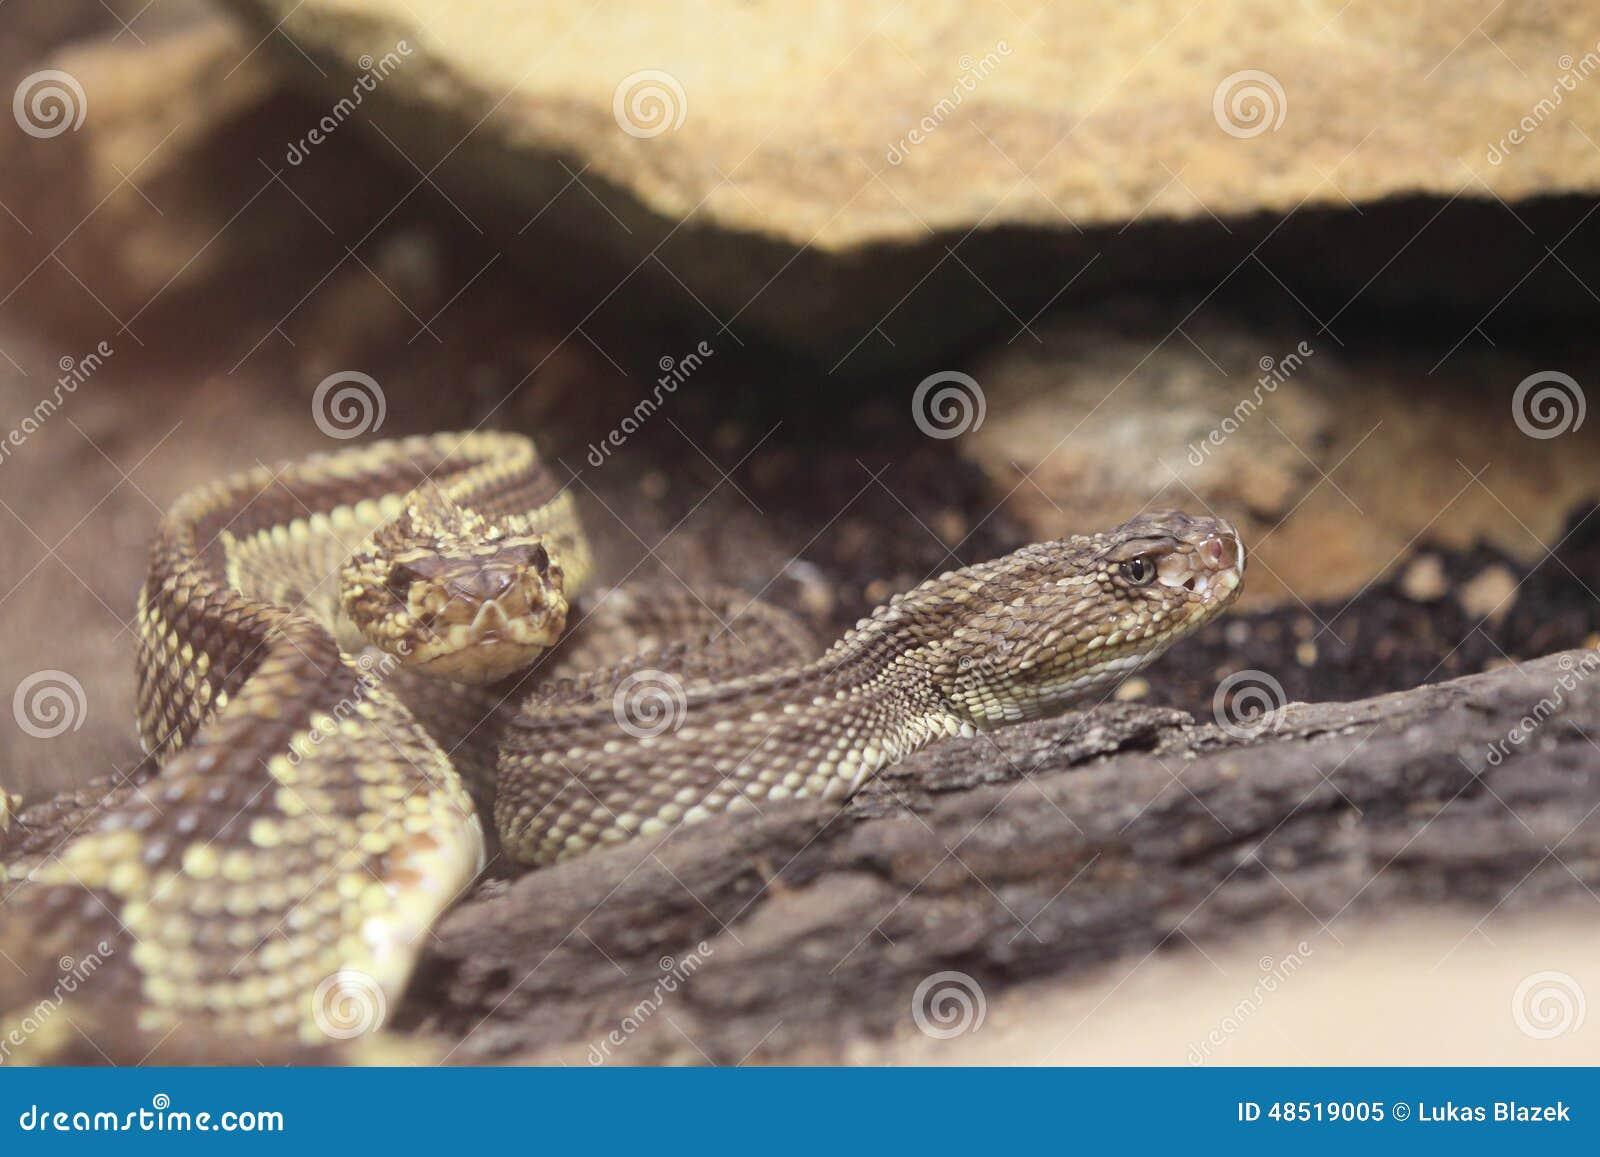 Serpiente De Cascabel Tropical Imagen de archivo - Imagen de animal ...